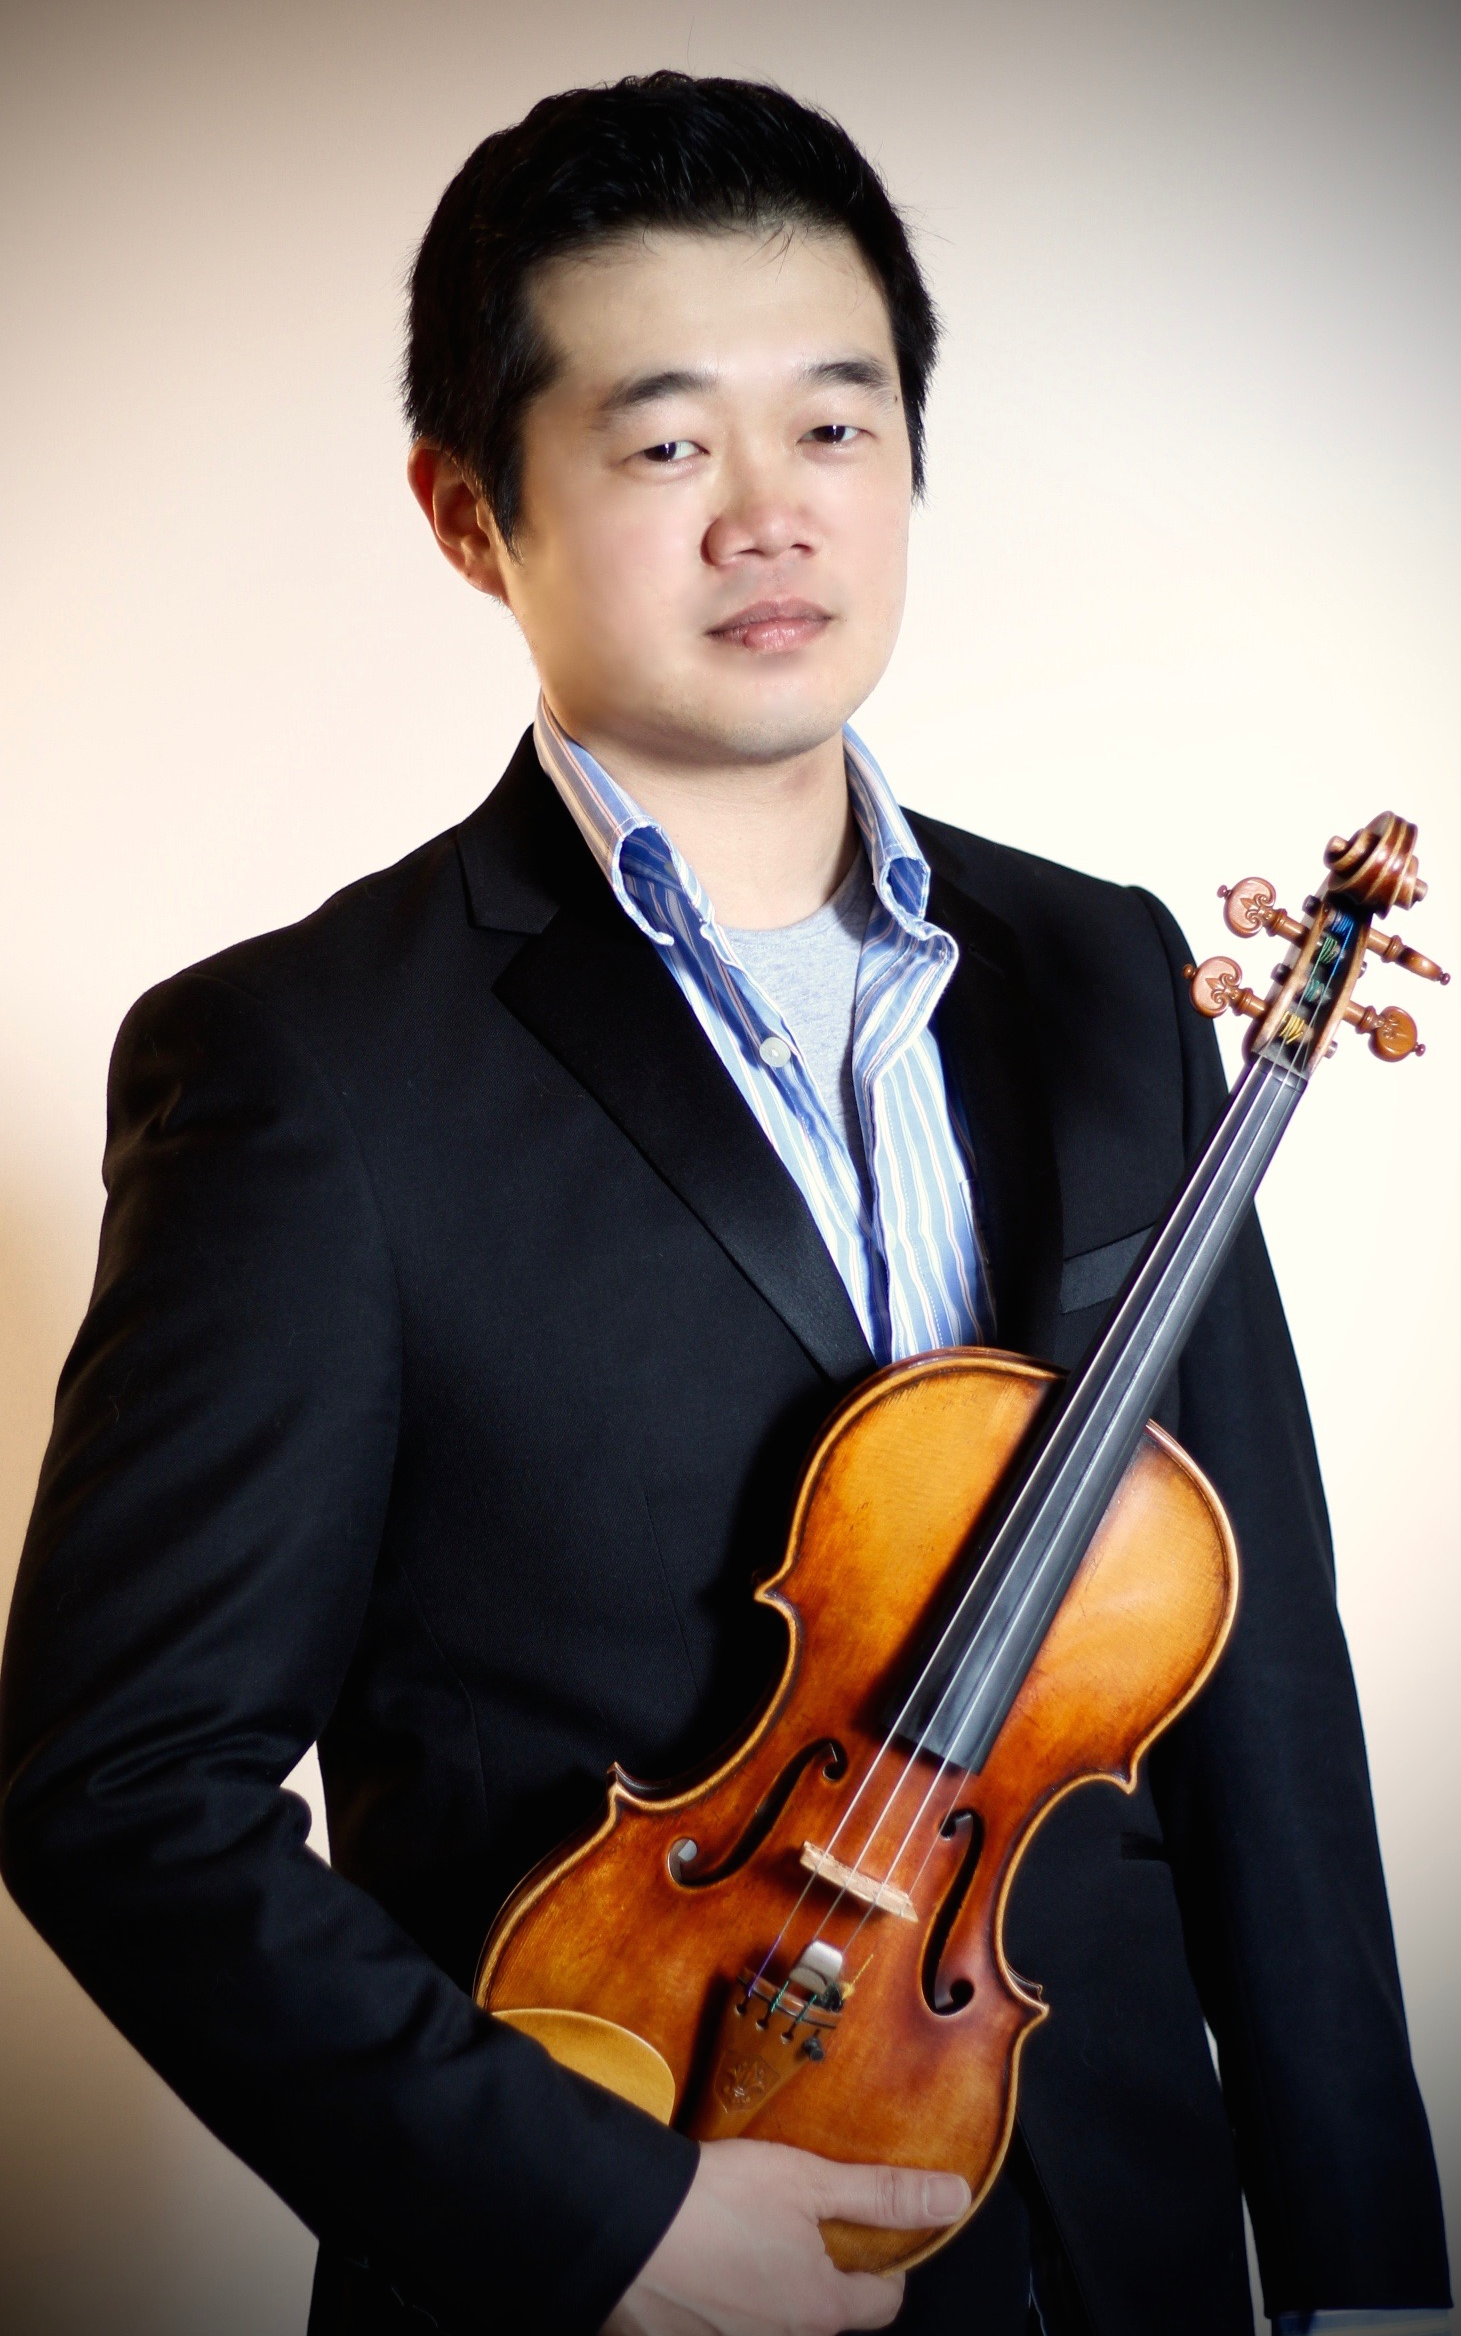 Ko Sugiyama - Assistant Concertmaster